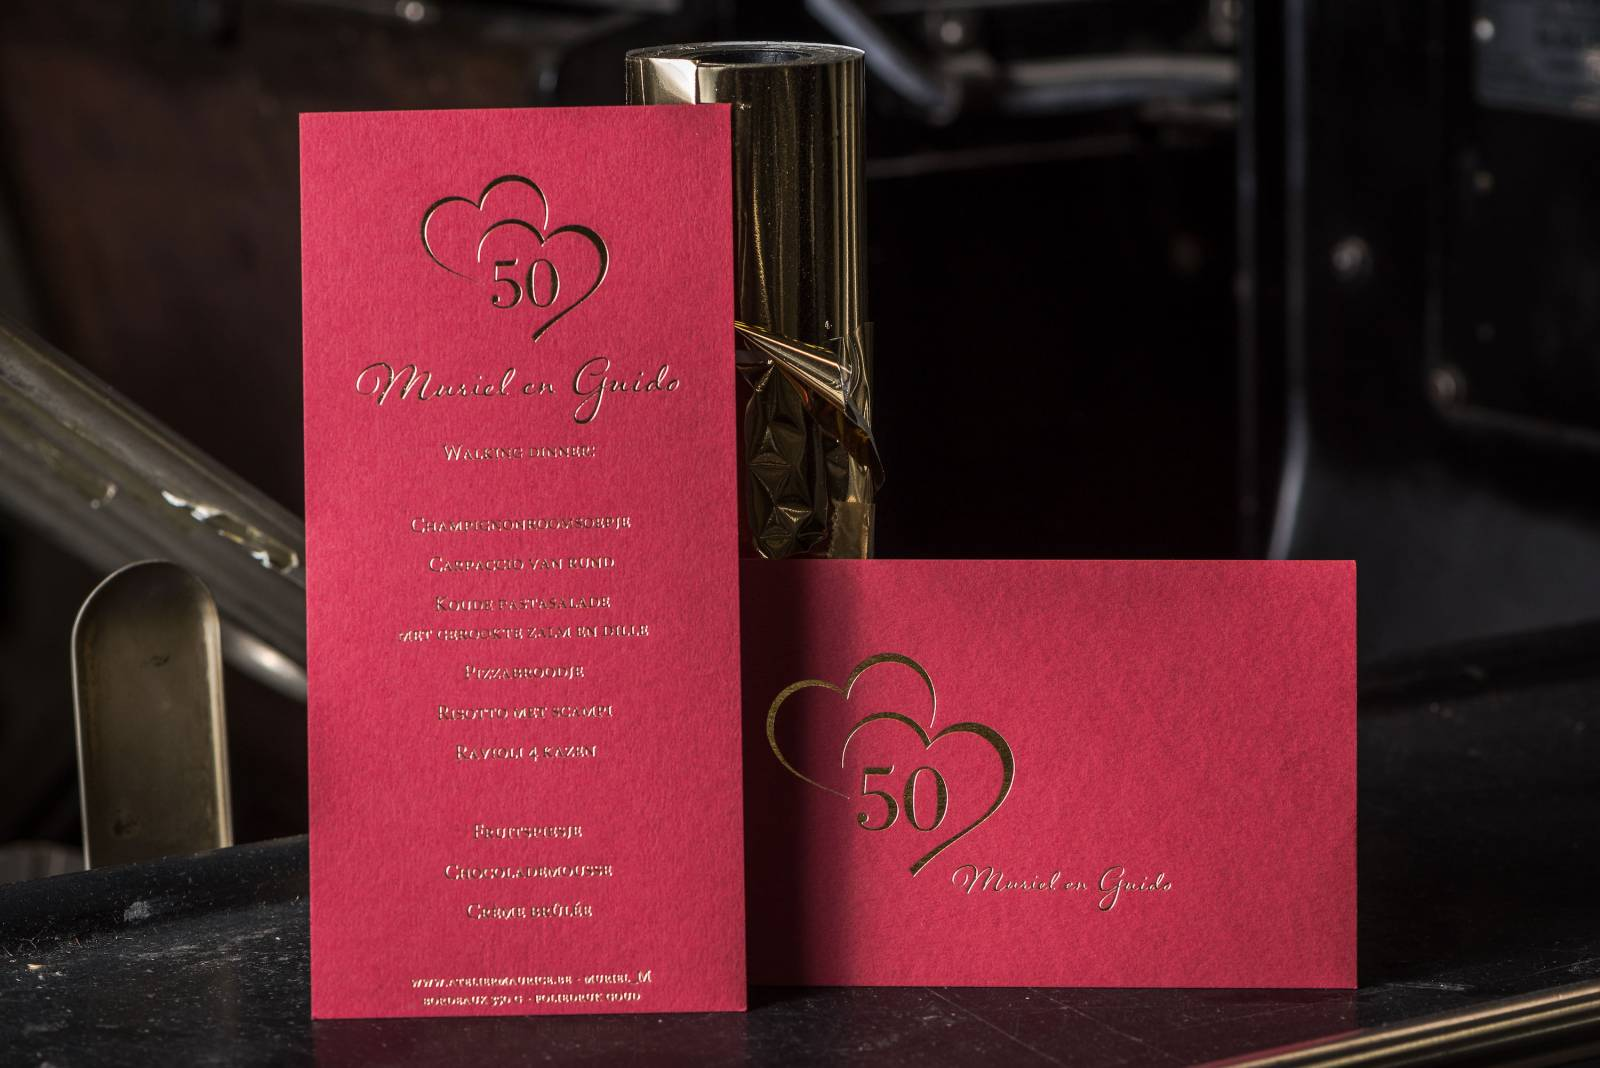 Atelier Maurice - Klaas De Buysser - Trouwuitnodigingen en drukwerk - House of Weddings 6